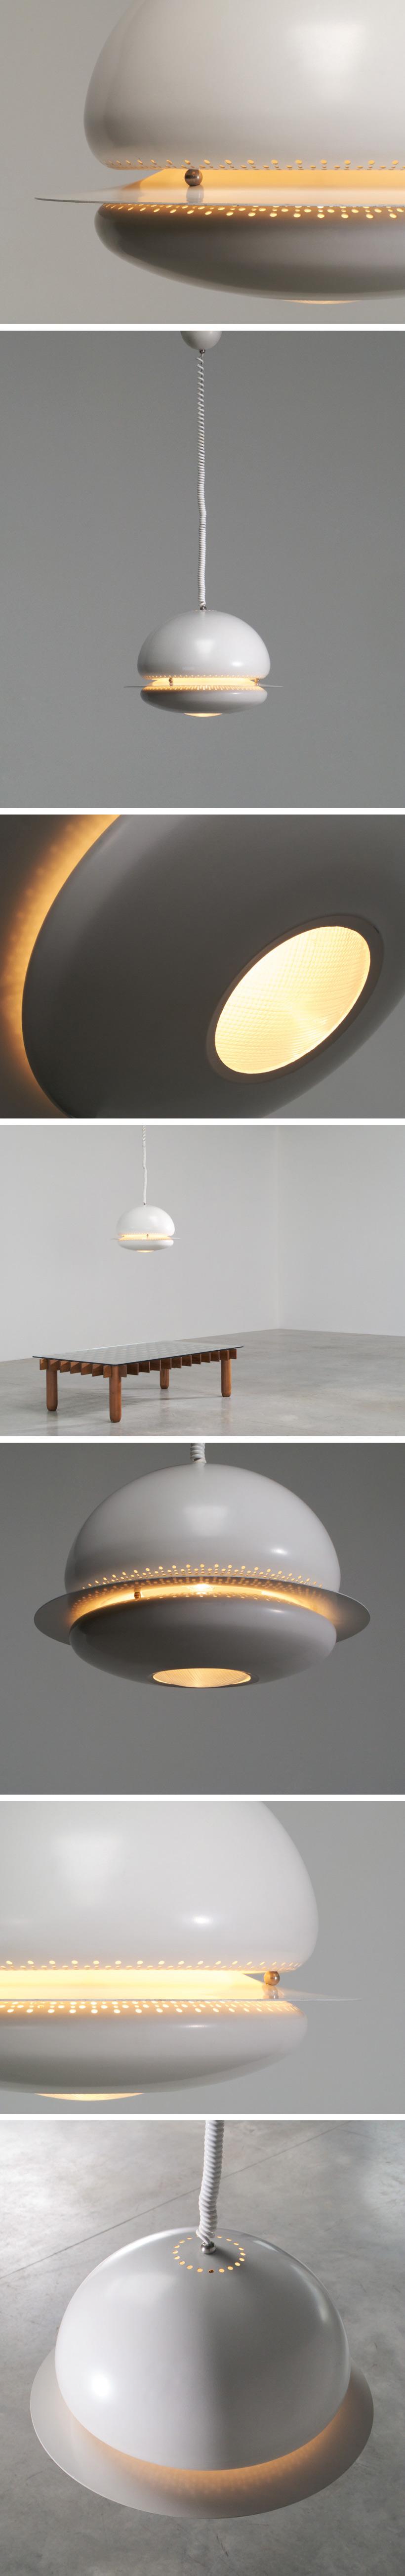 Tobia Scarpa Nictea ceiling lamp Flos Large